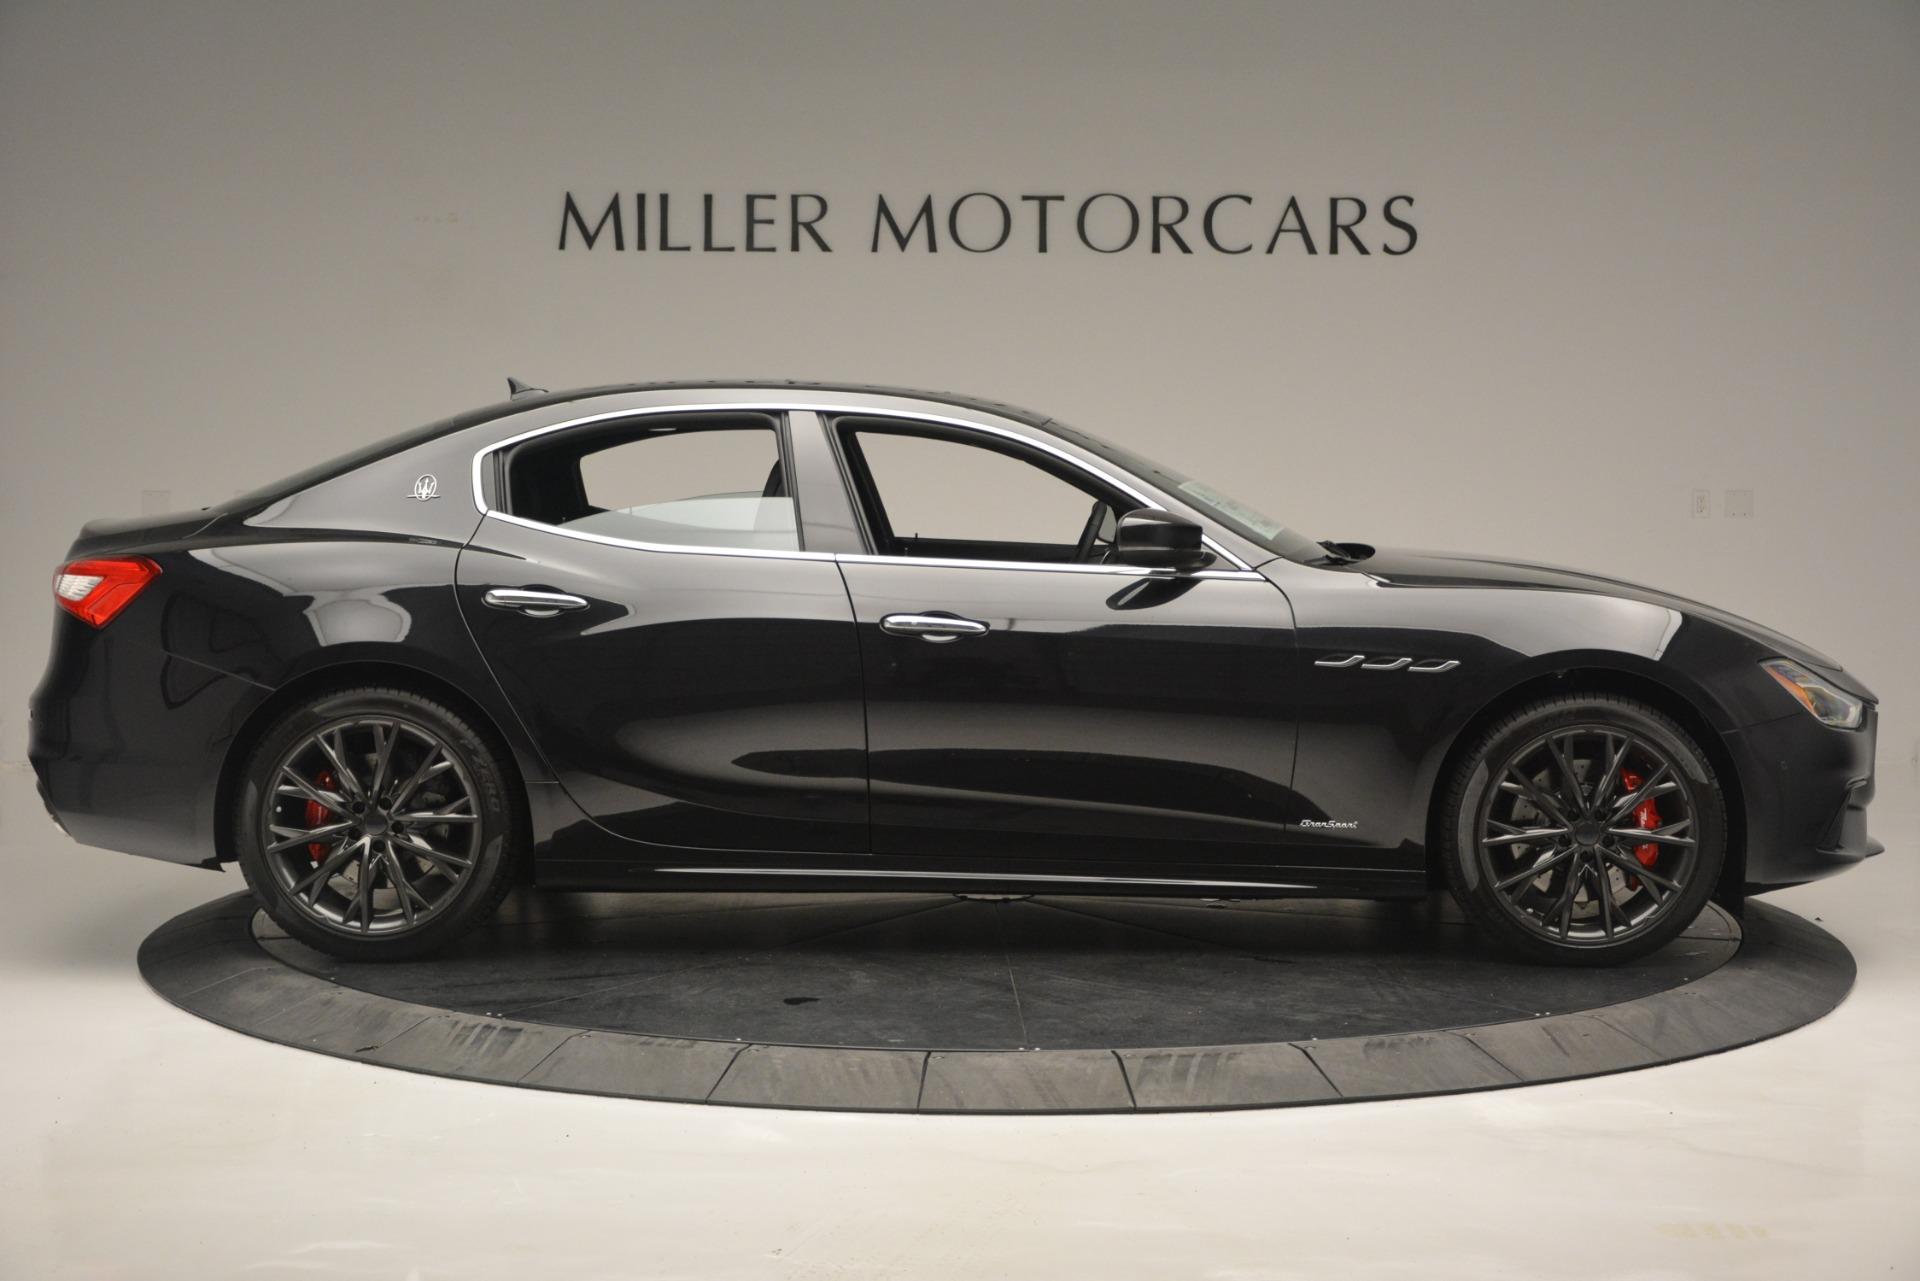 New 2019 Maserati Ghibli S Q4 GranSport For Sale 91080 In Greenwich, CT